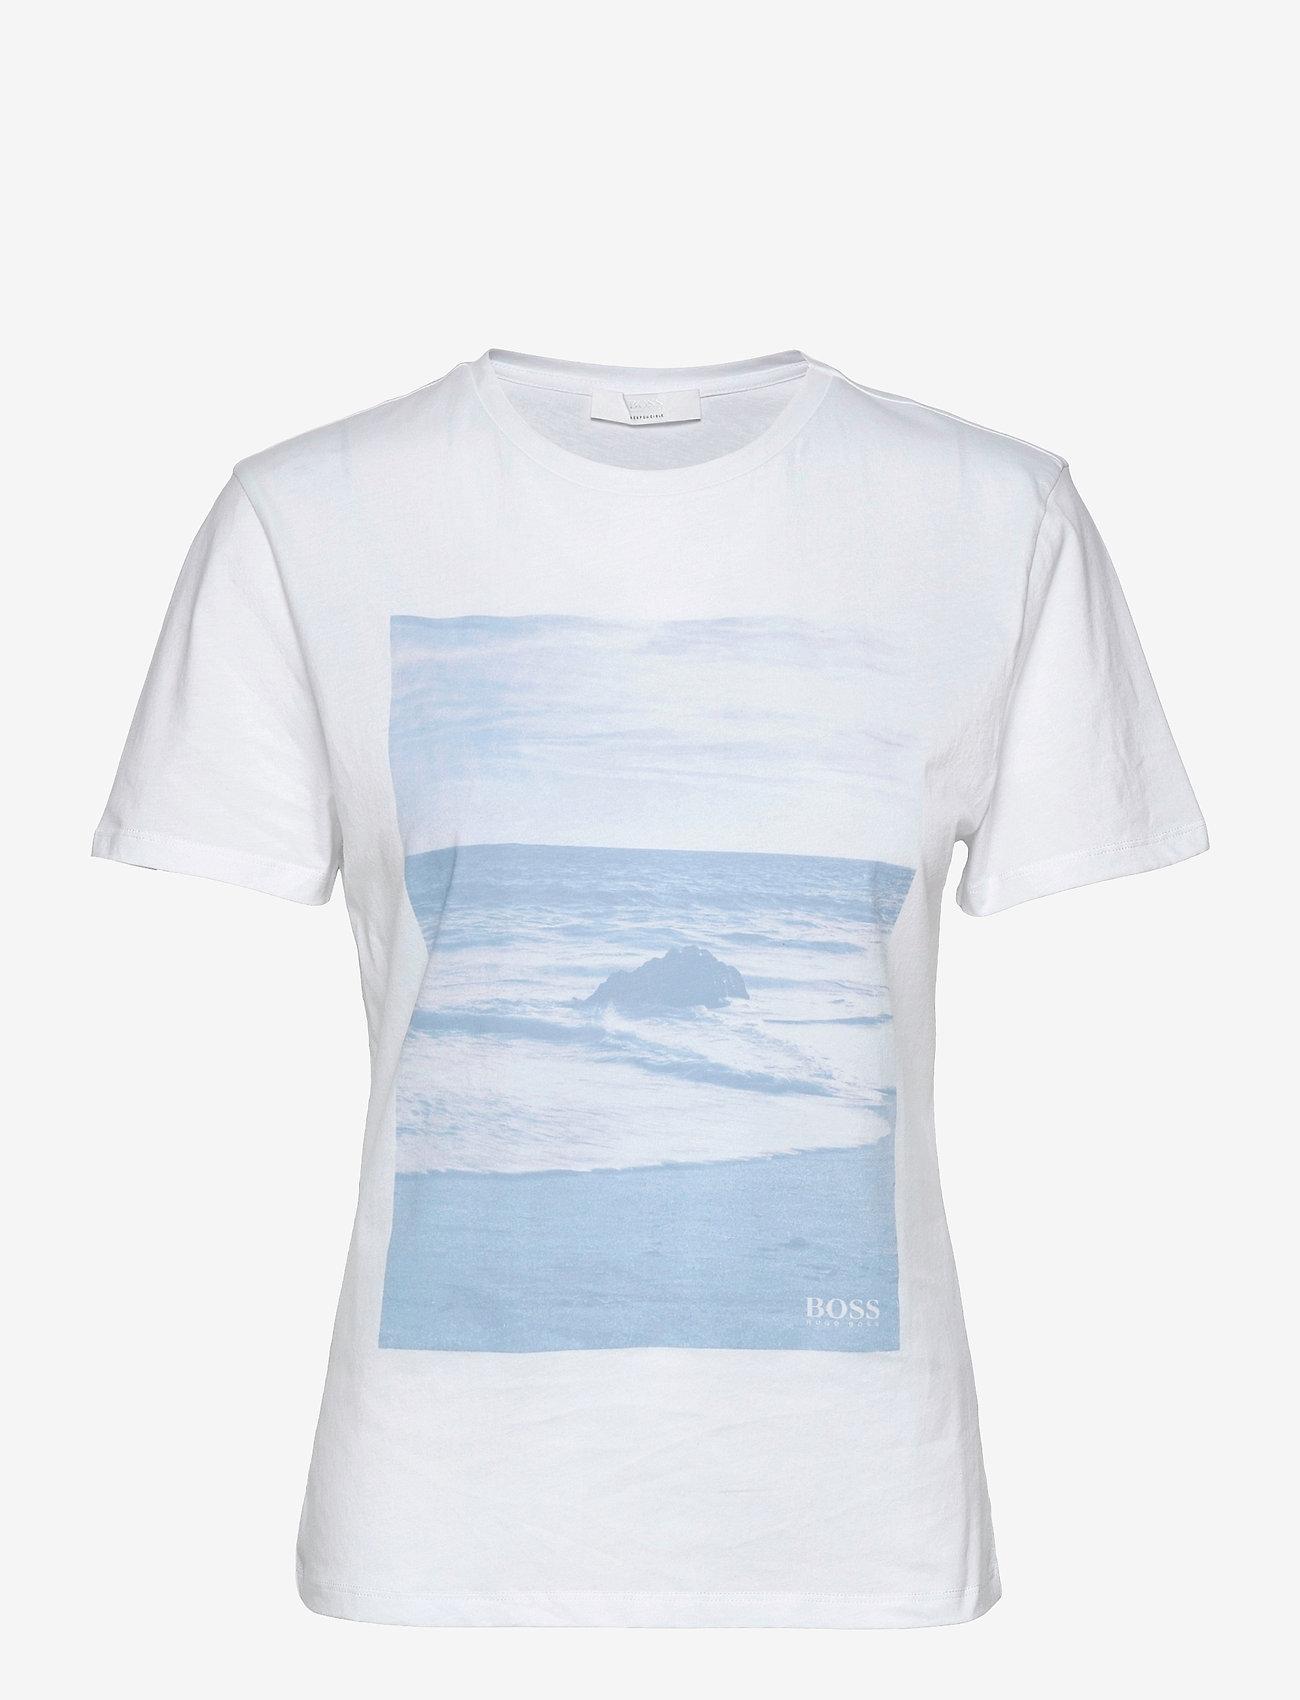 BOSS - C_Eima - t-shirts - natural - 0